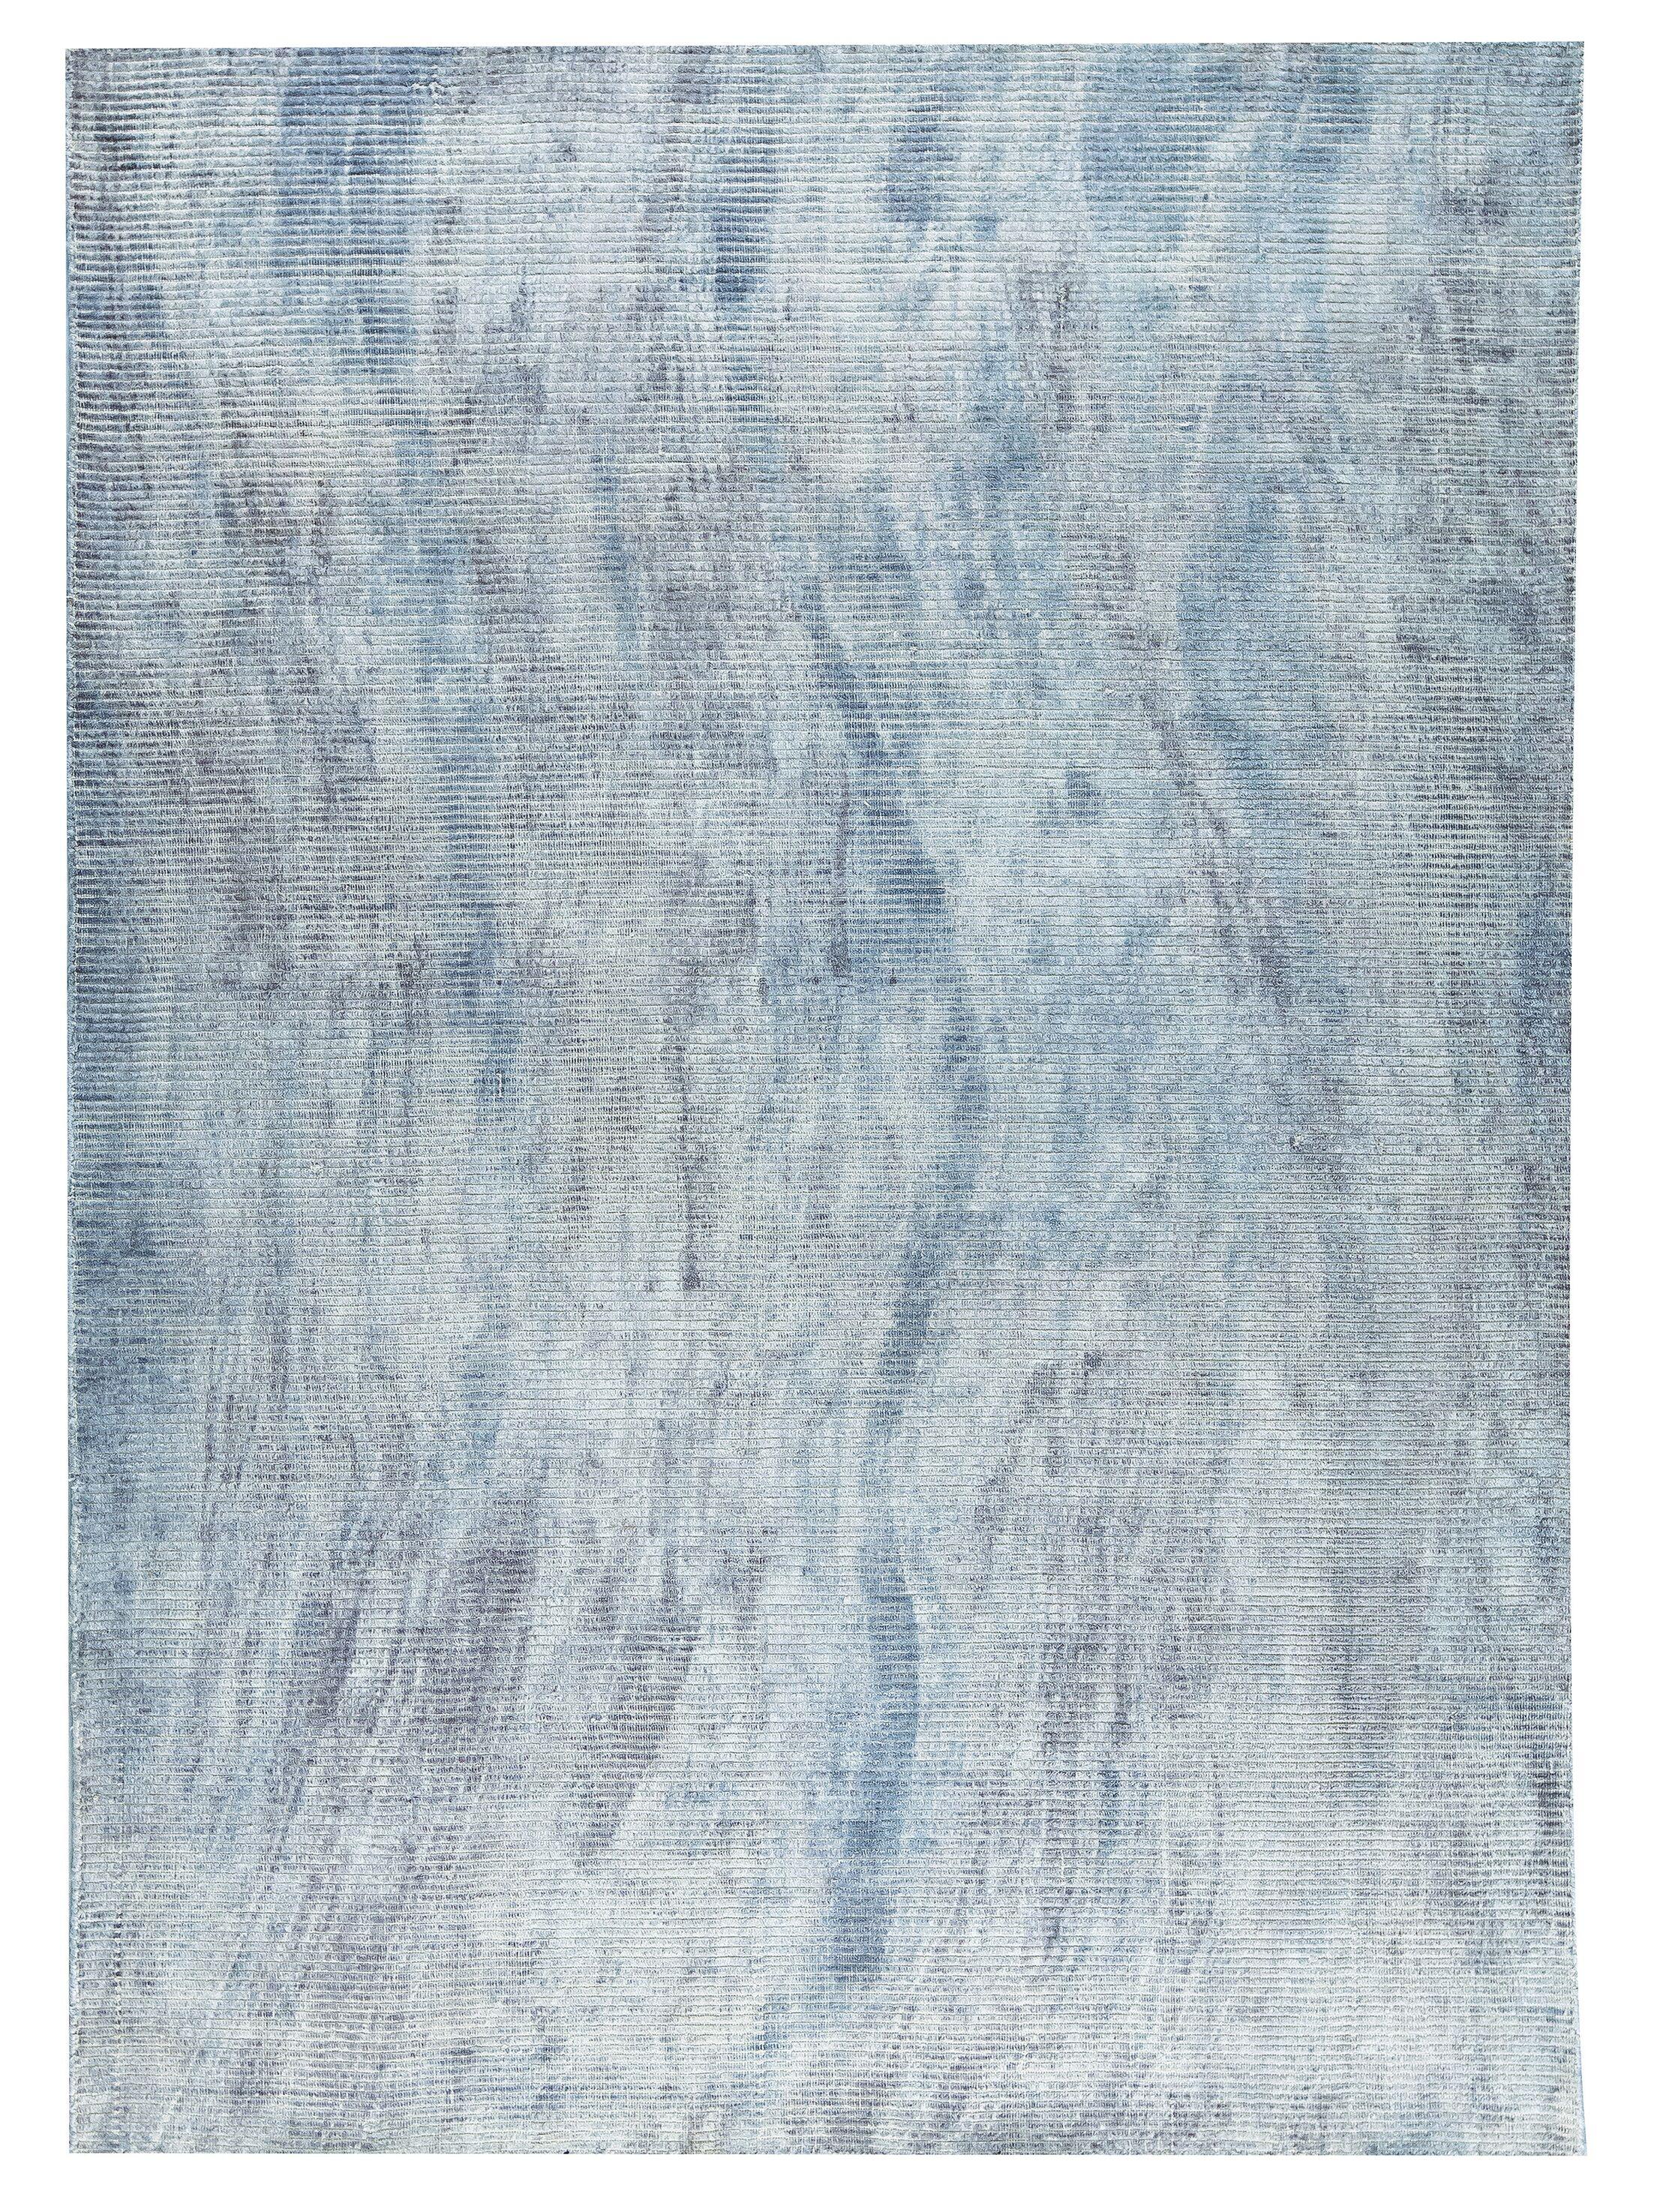 Reno Hand-Woven Soft Gray Area Rug Rug Size: 5' x 8'